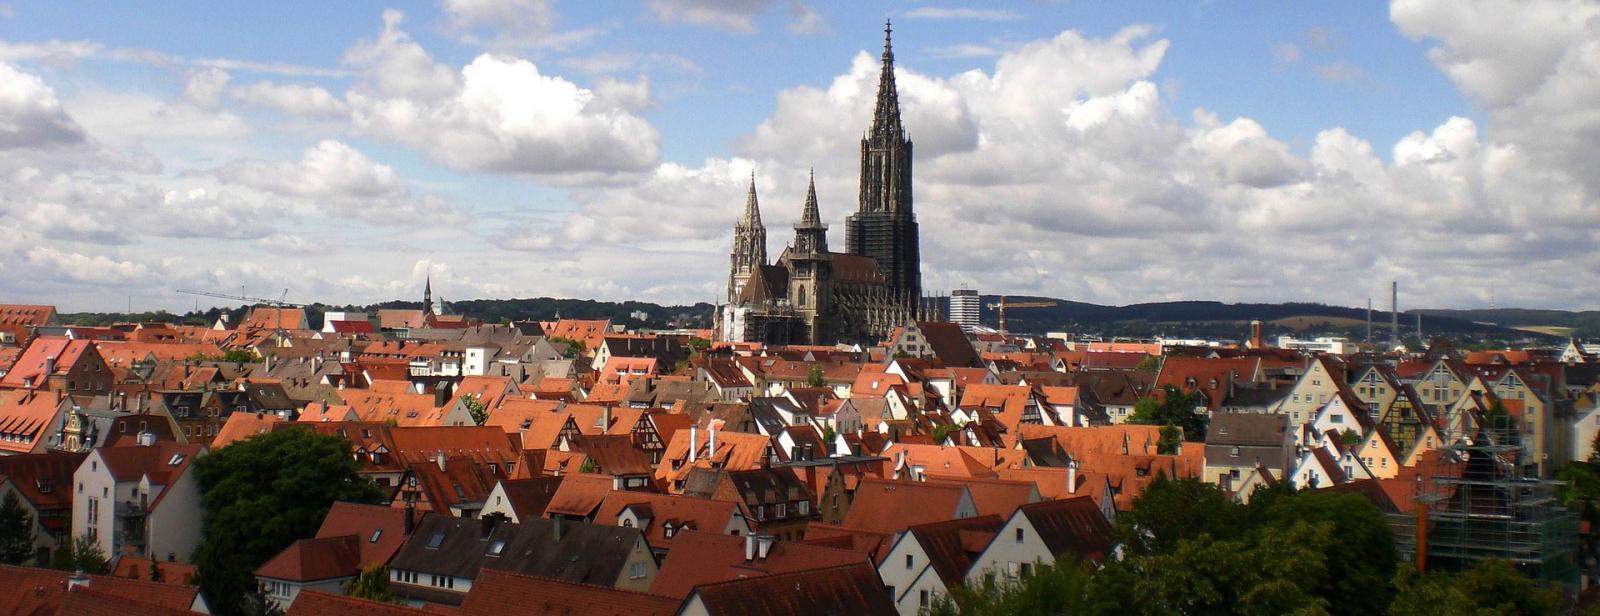 Ulm-silhouette-bild